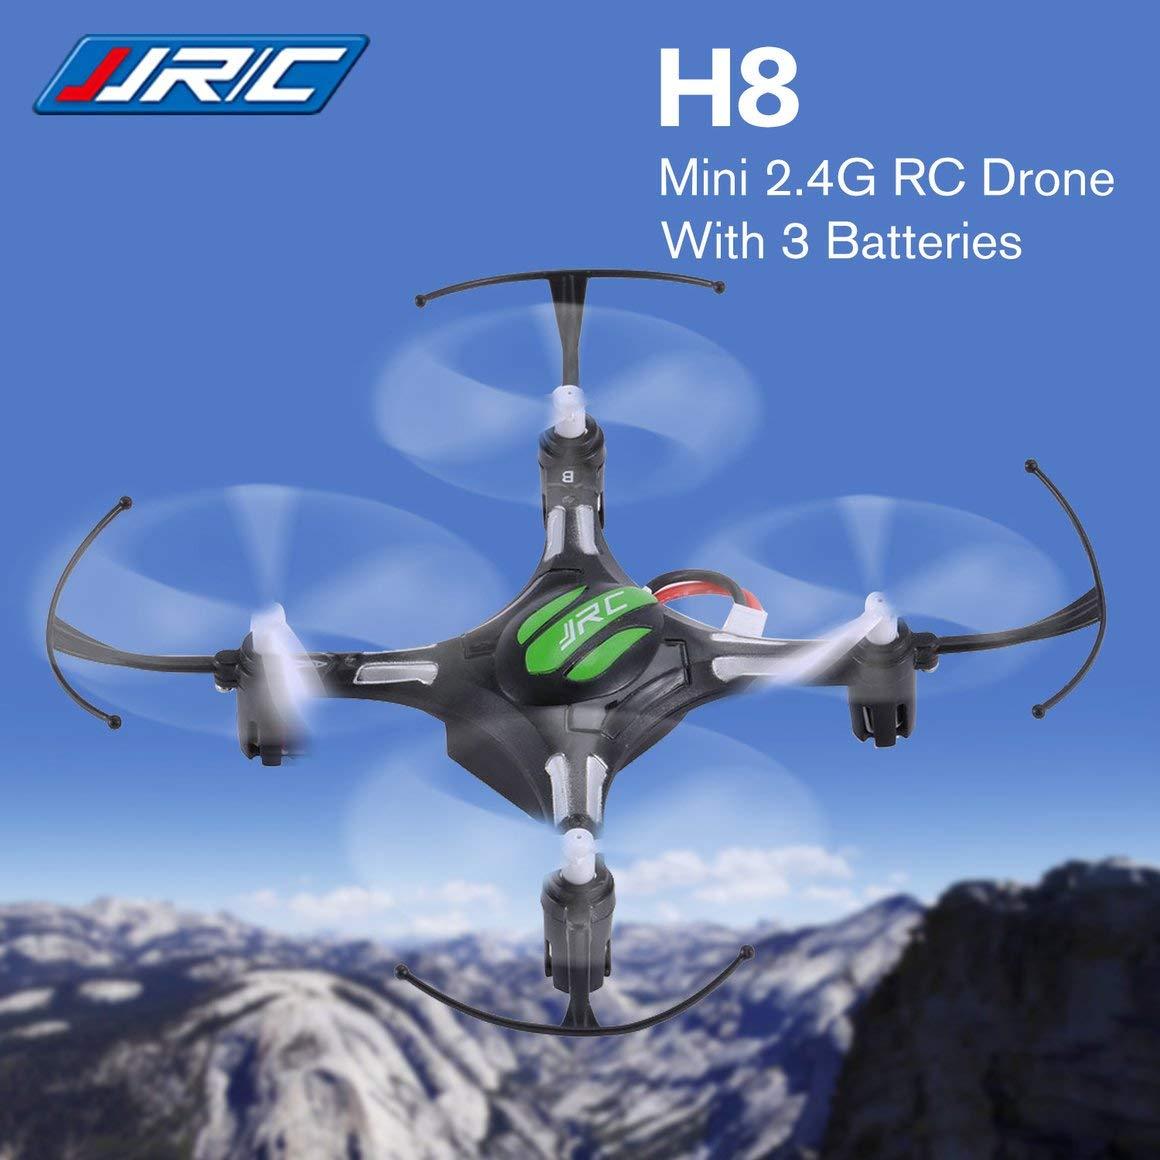 Funnyrunstore JJR / C H8 Mini 2.4G 4CH 6-Ejes Gyro Drone RC ...